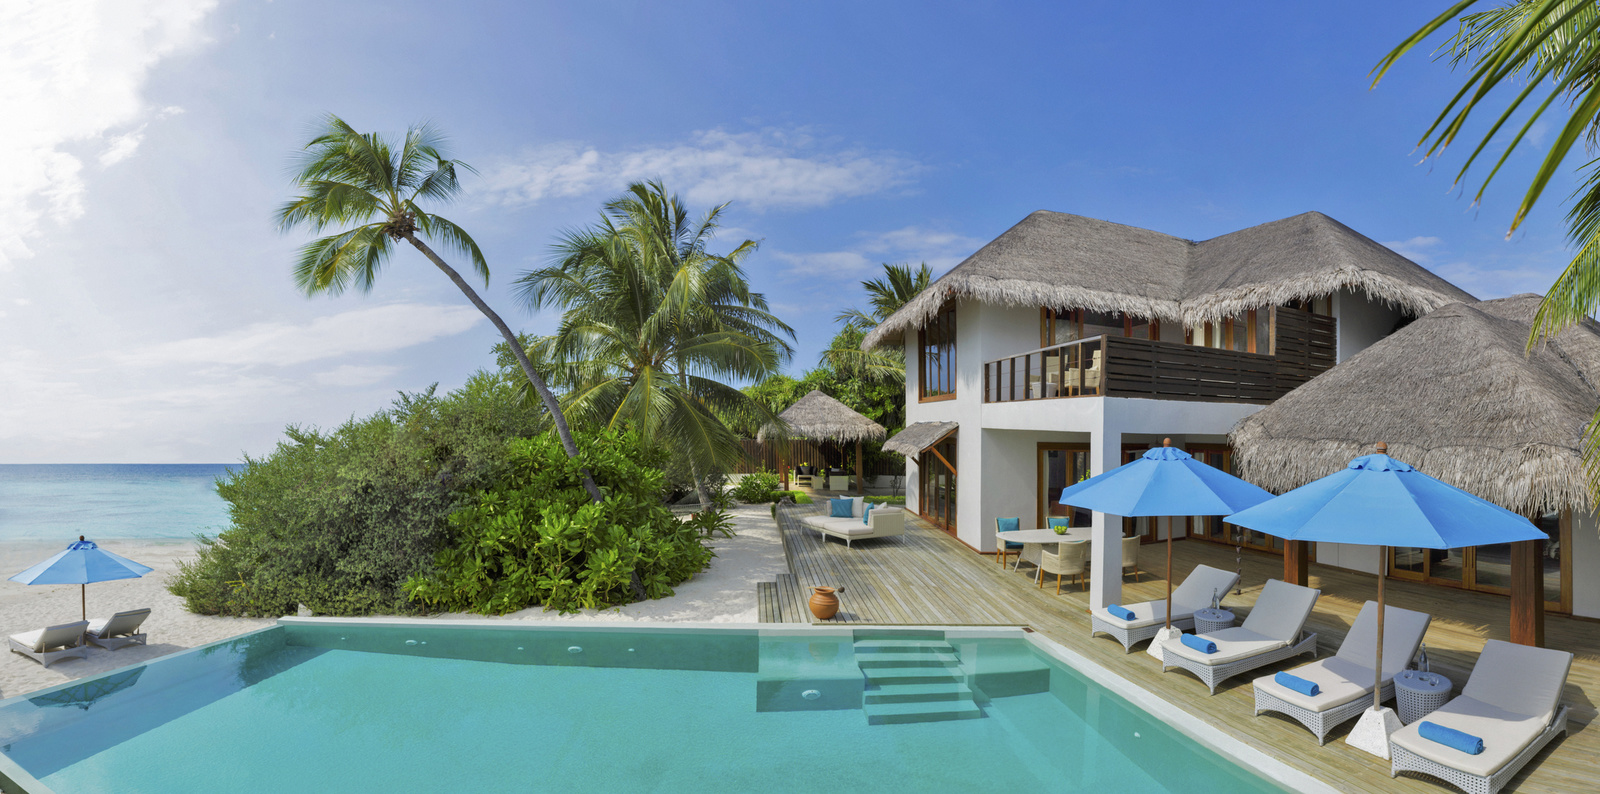 Dusit Thani Maldives Indulge Maldives